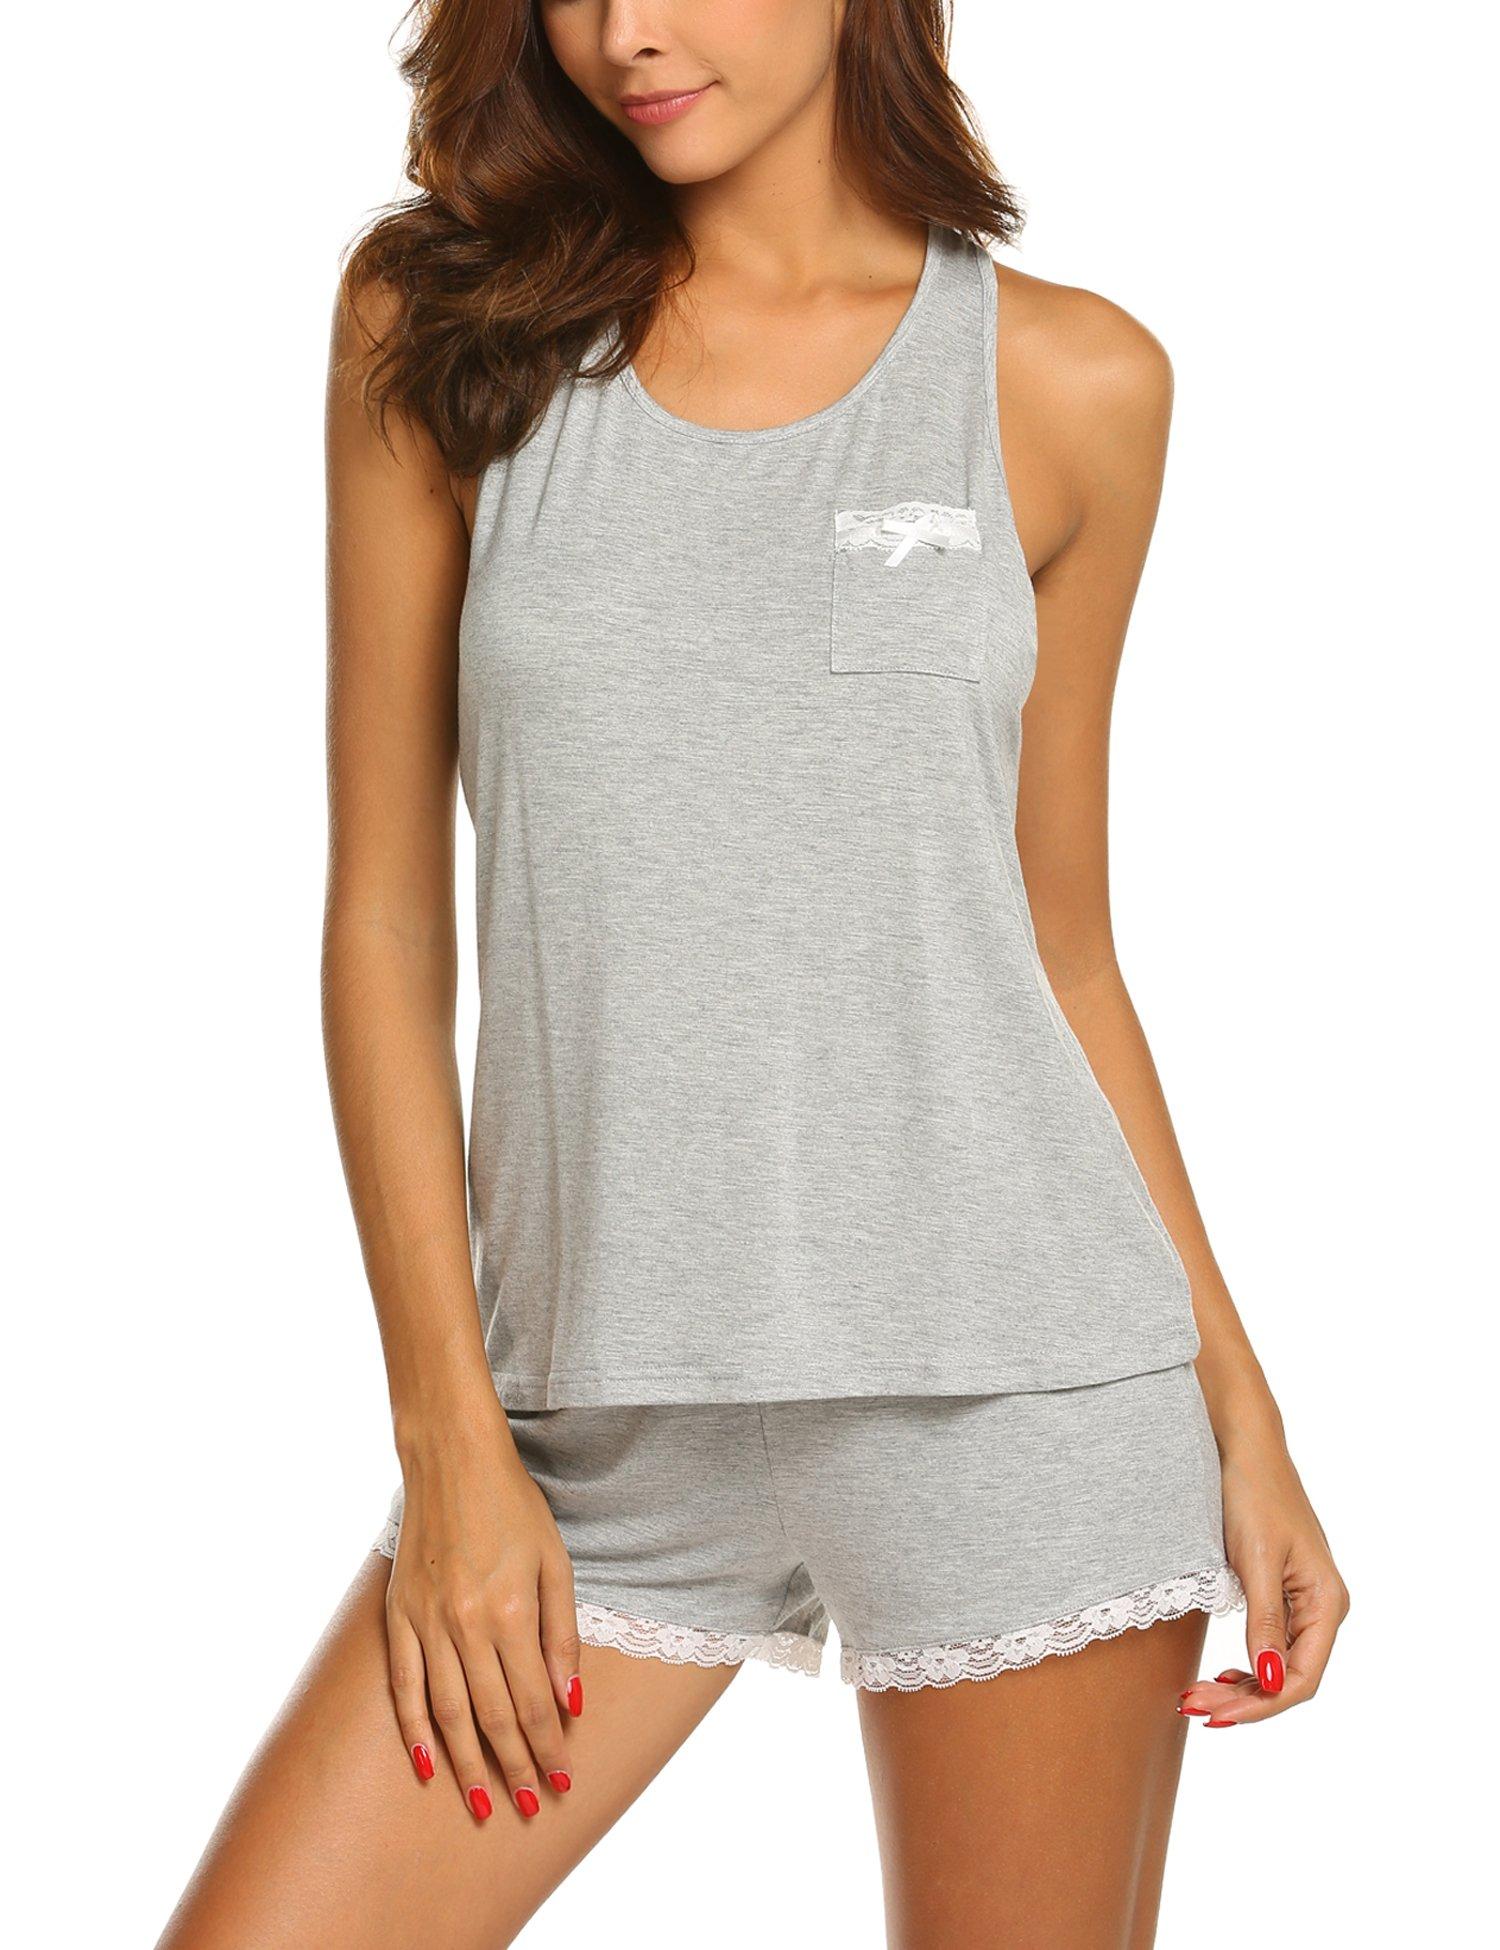 MAXMODA Women's Lace Sexy Pajama Set Sleeveless PJ Tank and Shorts Sleepwear Heather Grey S